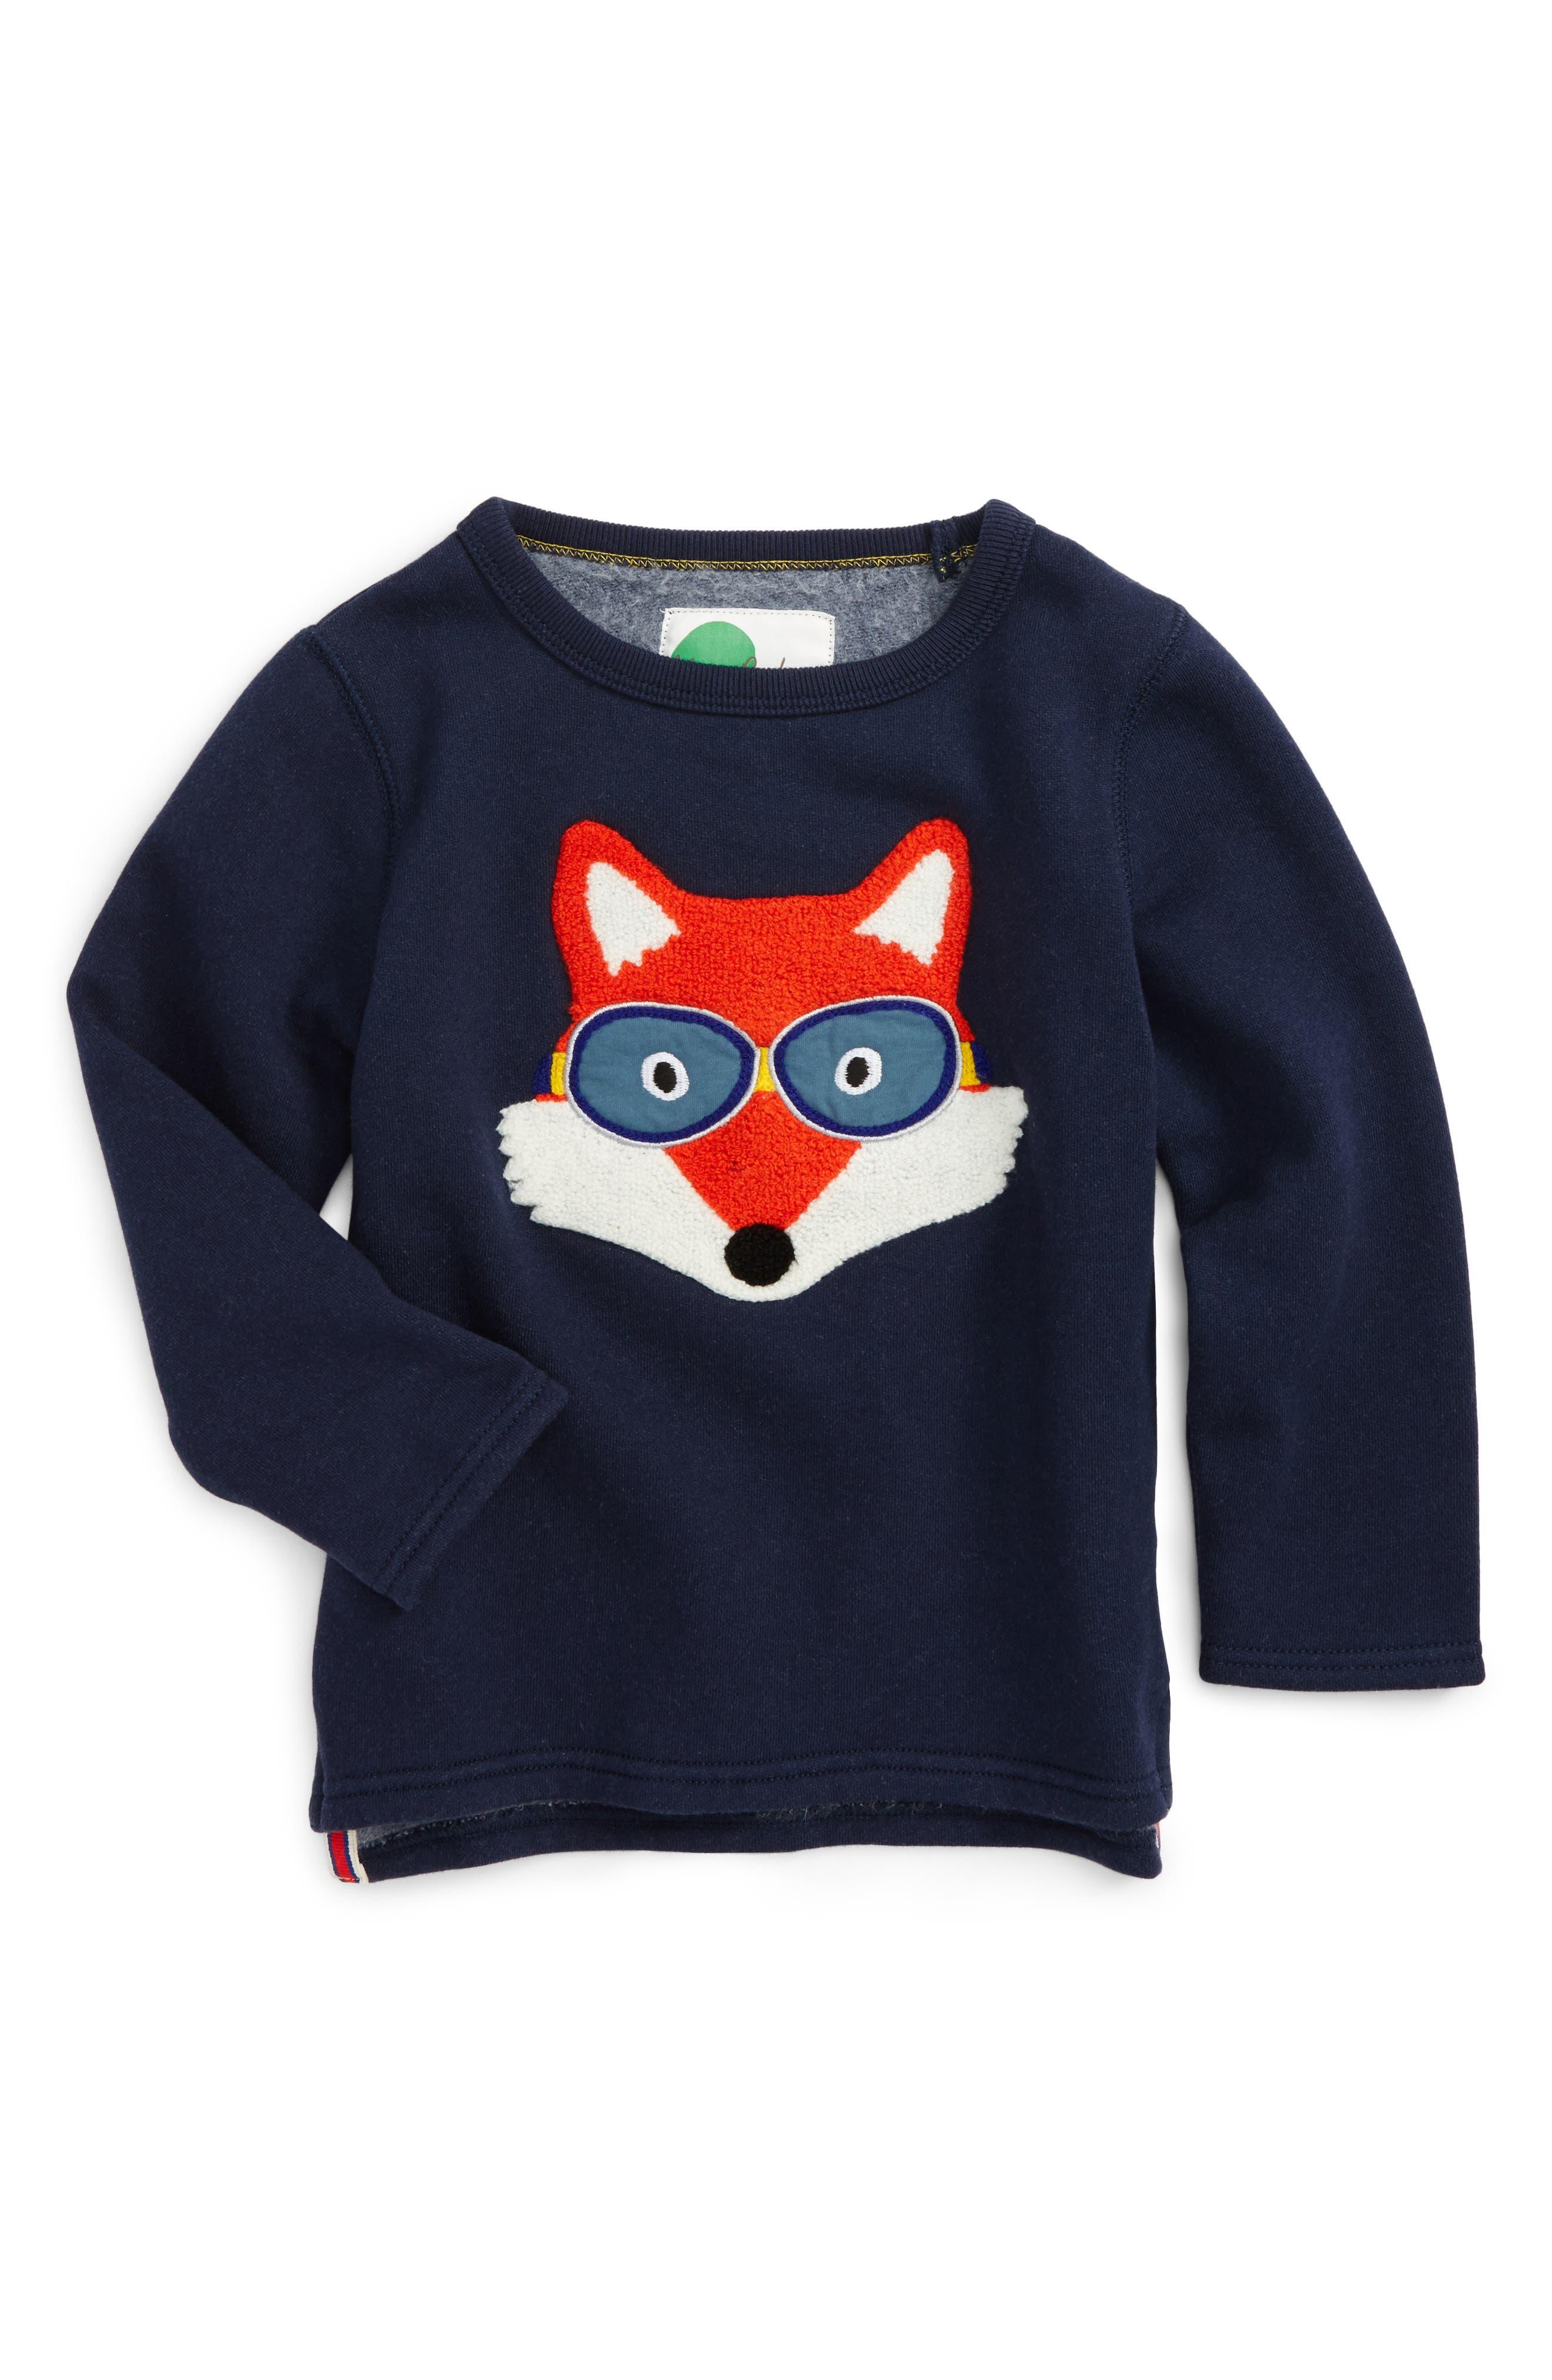 Mini Boden Open Road Sweatshirt (Toddler Boys, Little Boys & Big Boys)